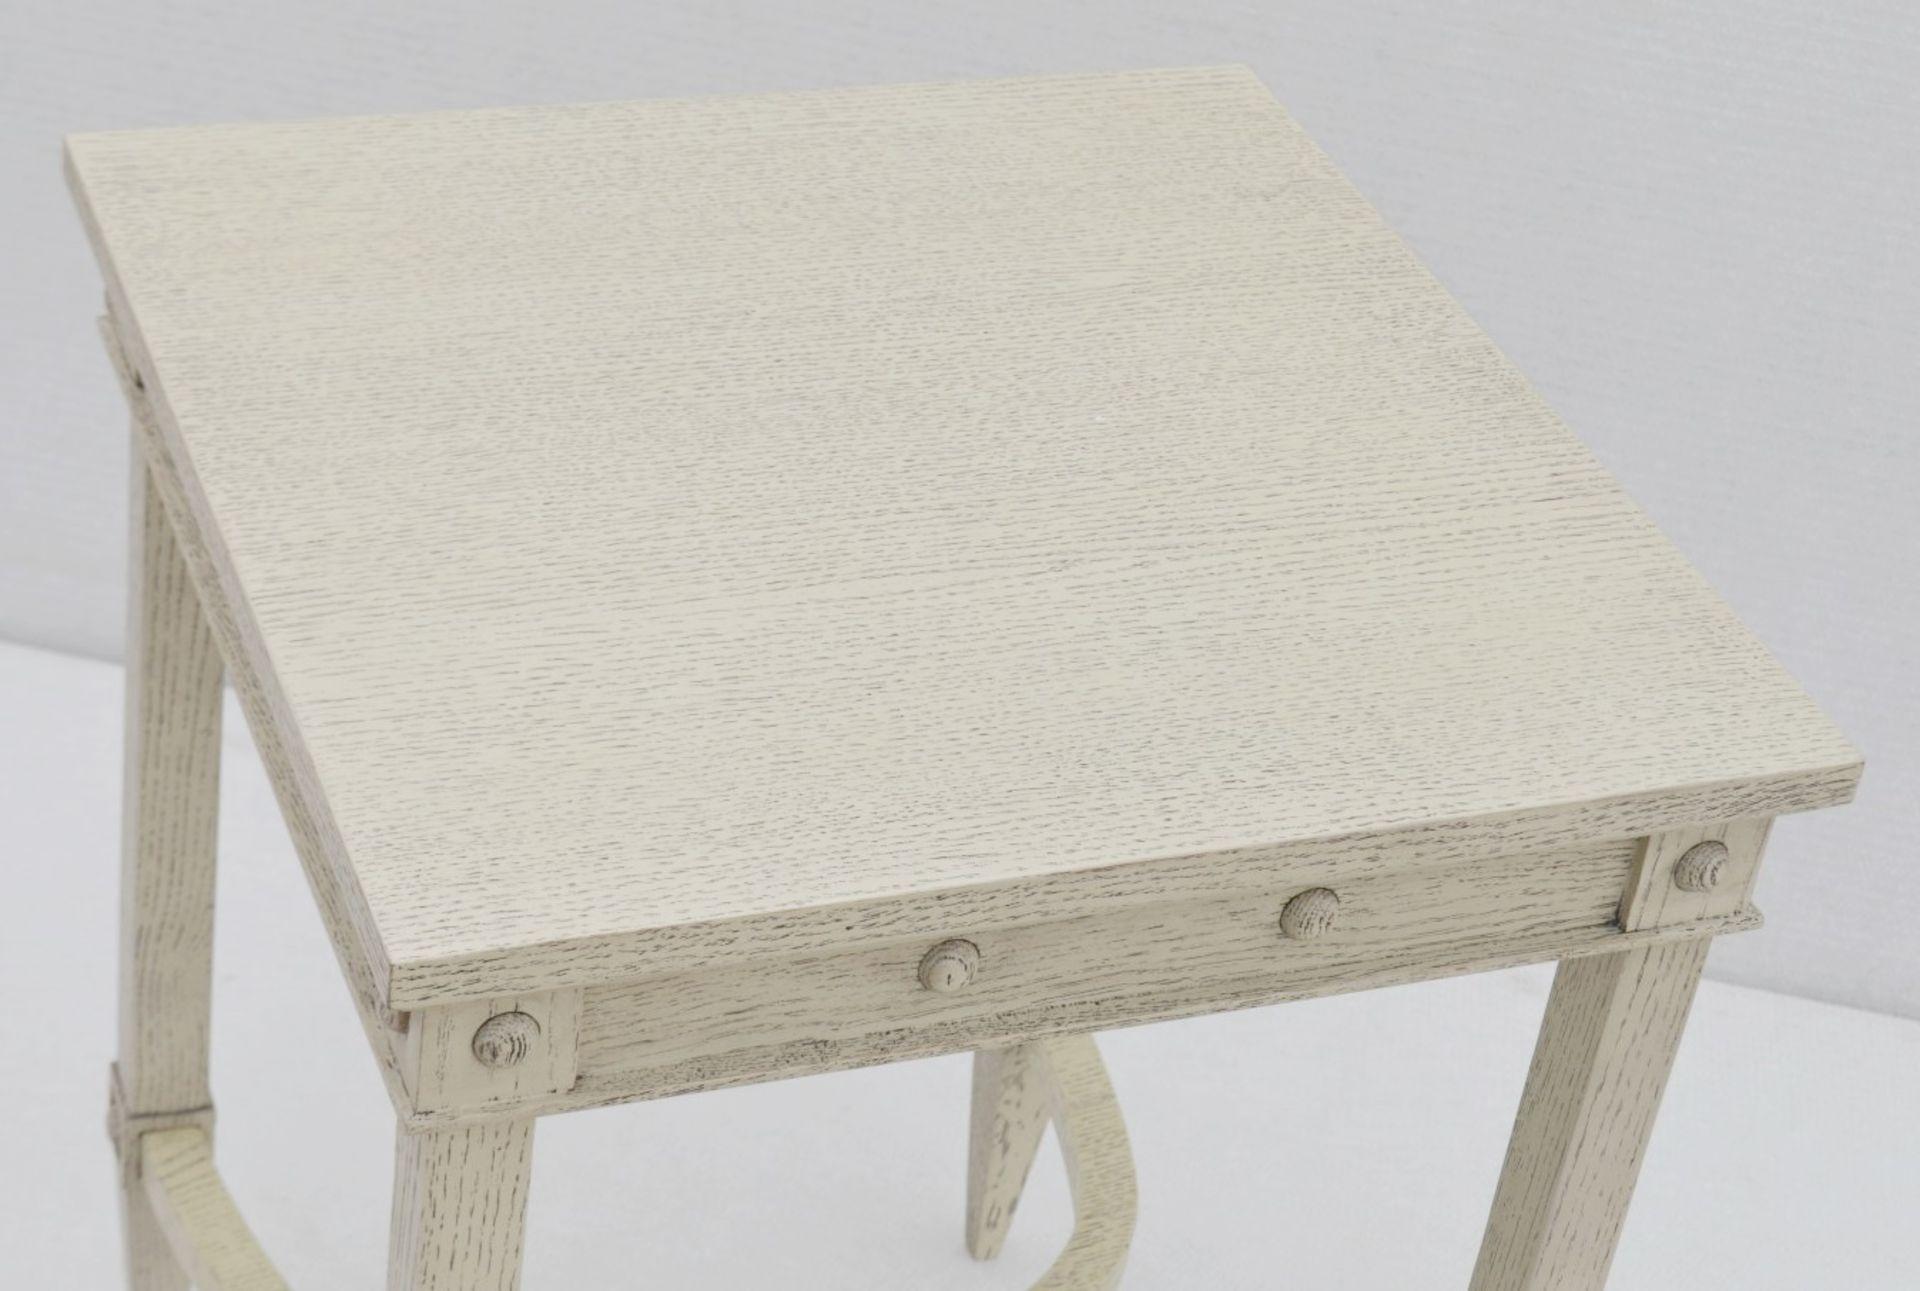 1 x JUSTIN VAN BREDA 'Thomas' Designer Georgian-inspired Table In Limed Grey Oak - RRP £1,320 - Image 3 of 6